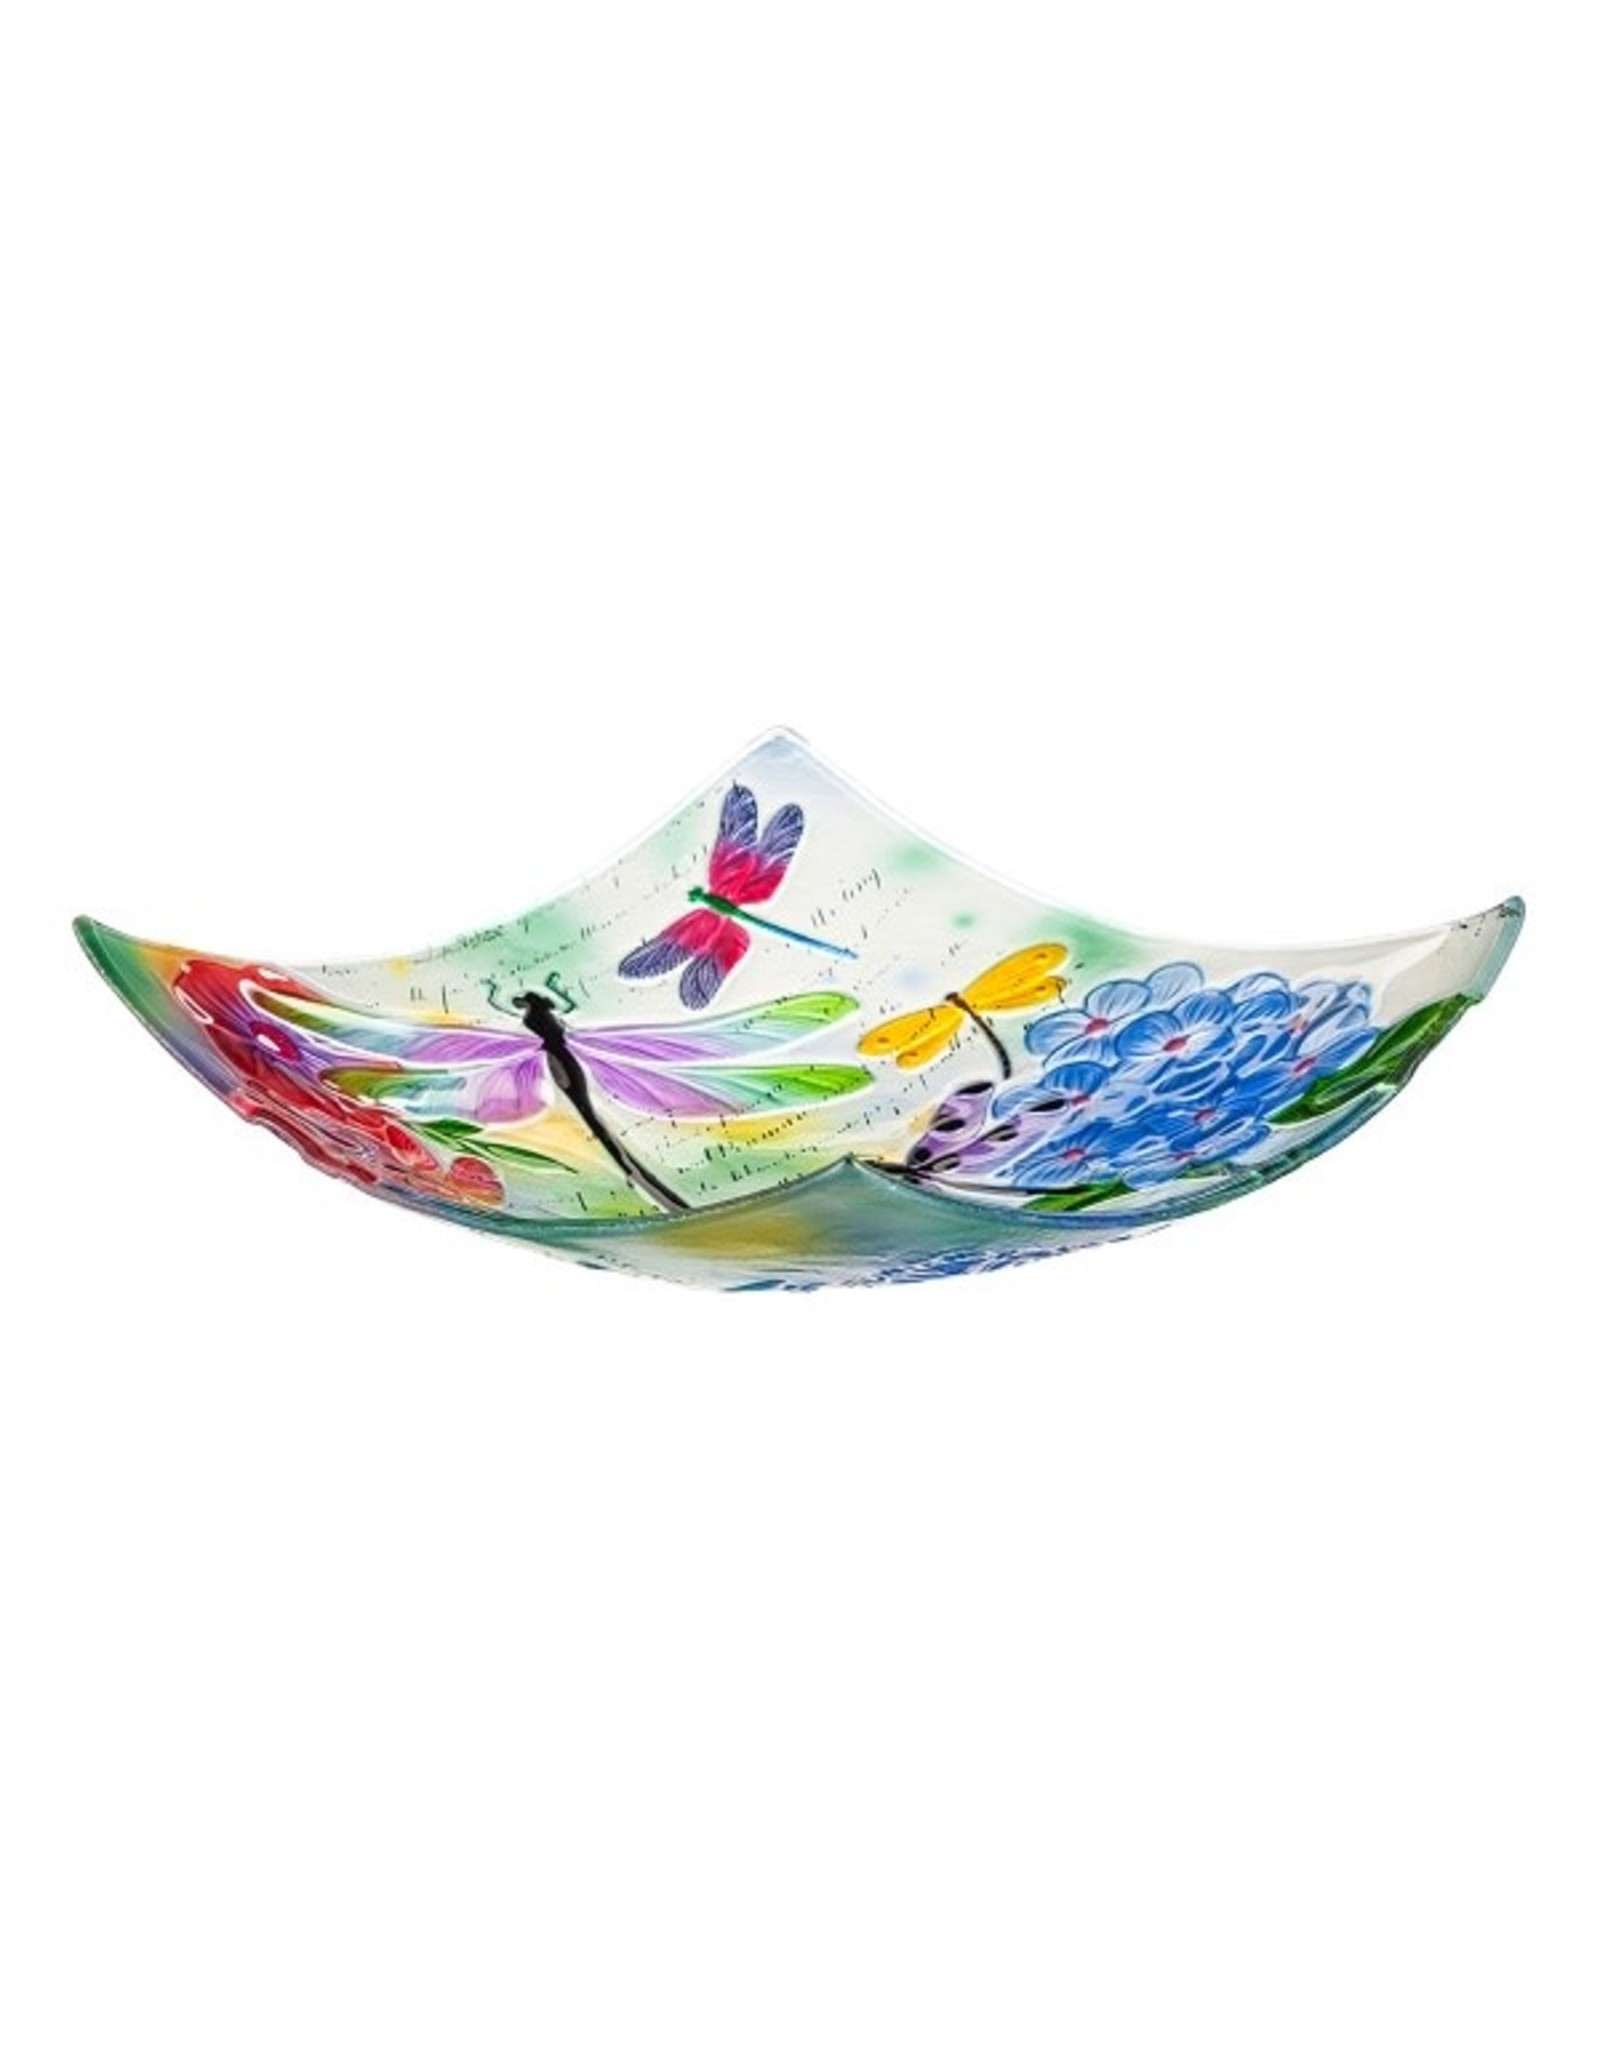 Evergreen DRAGONFLY SQUARE GLASS BIRD BATH